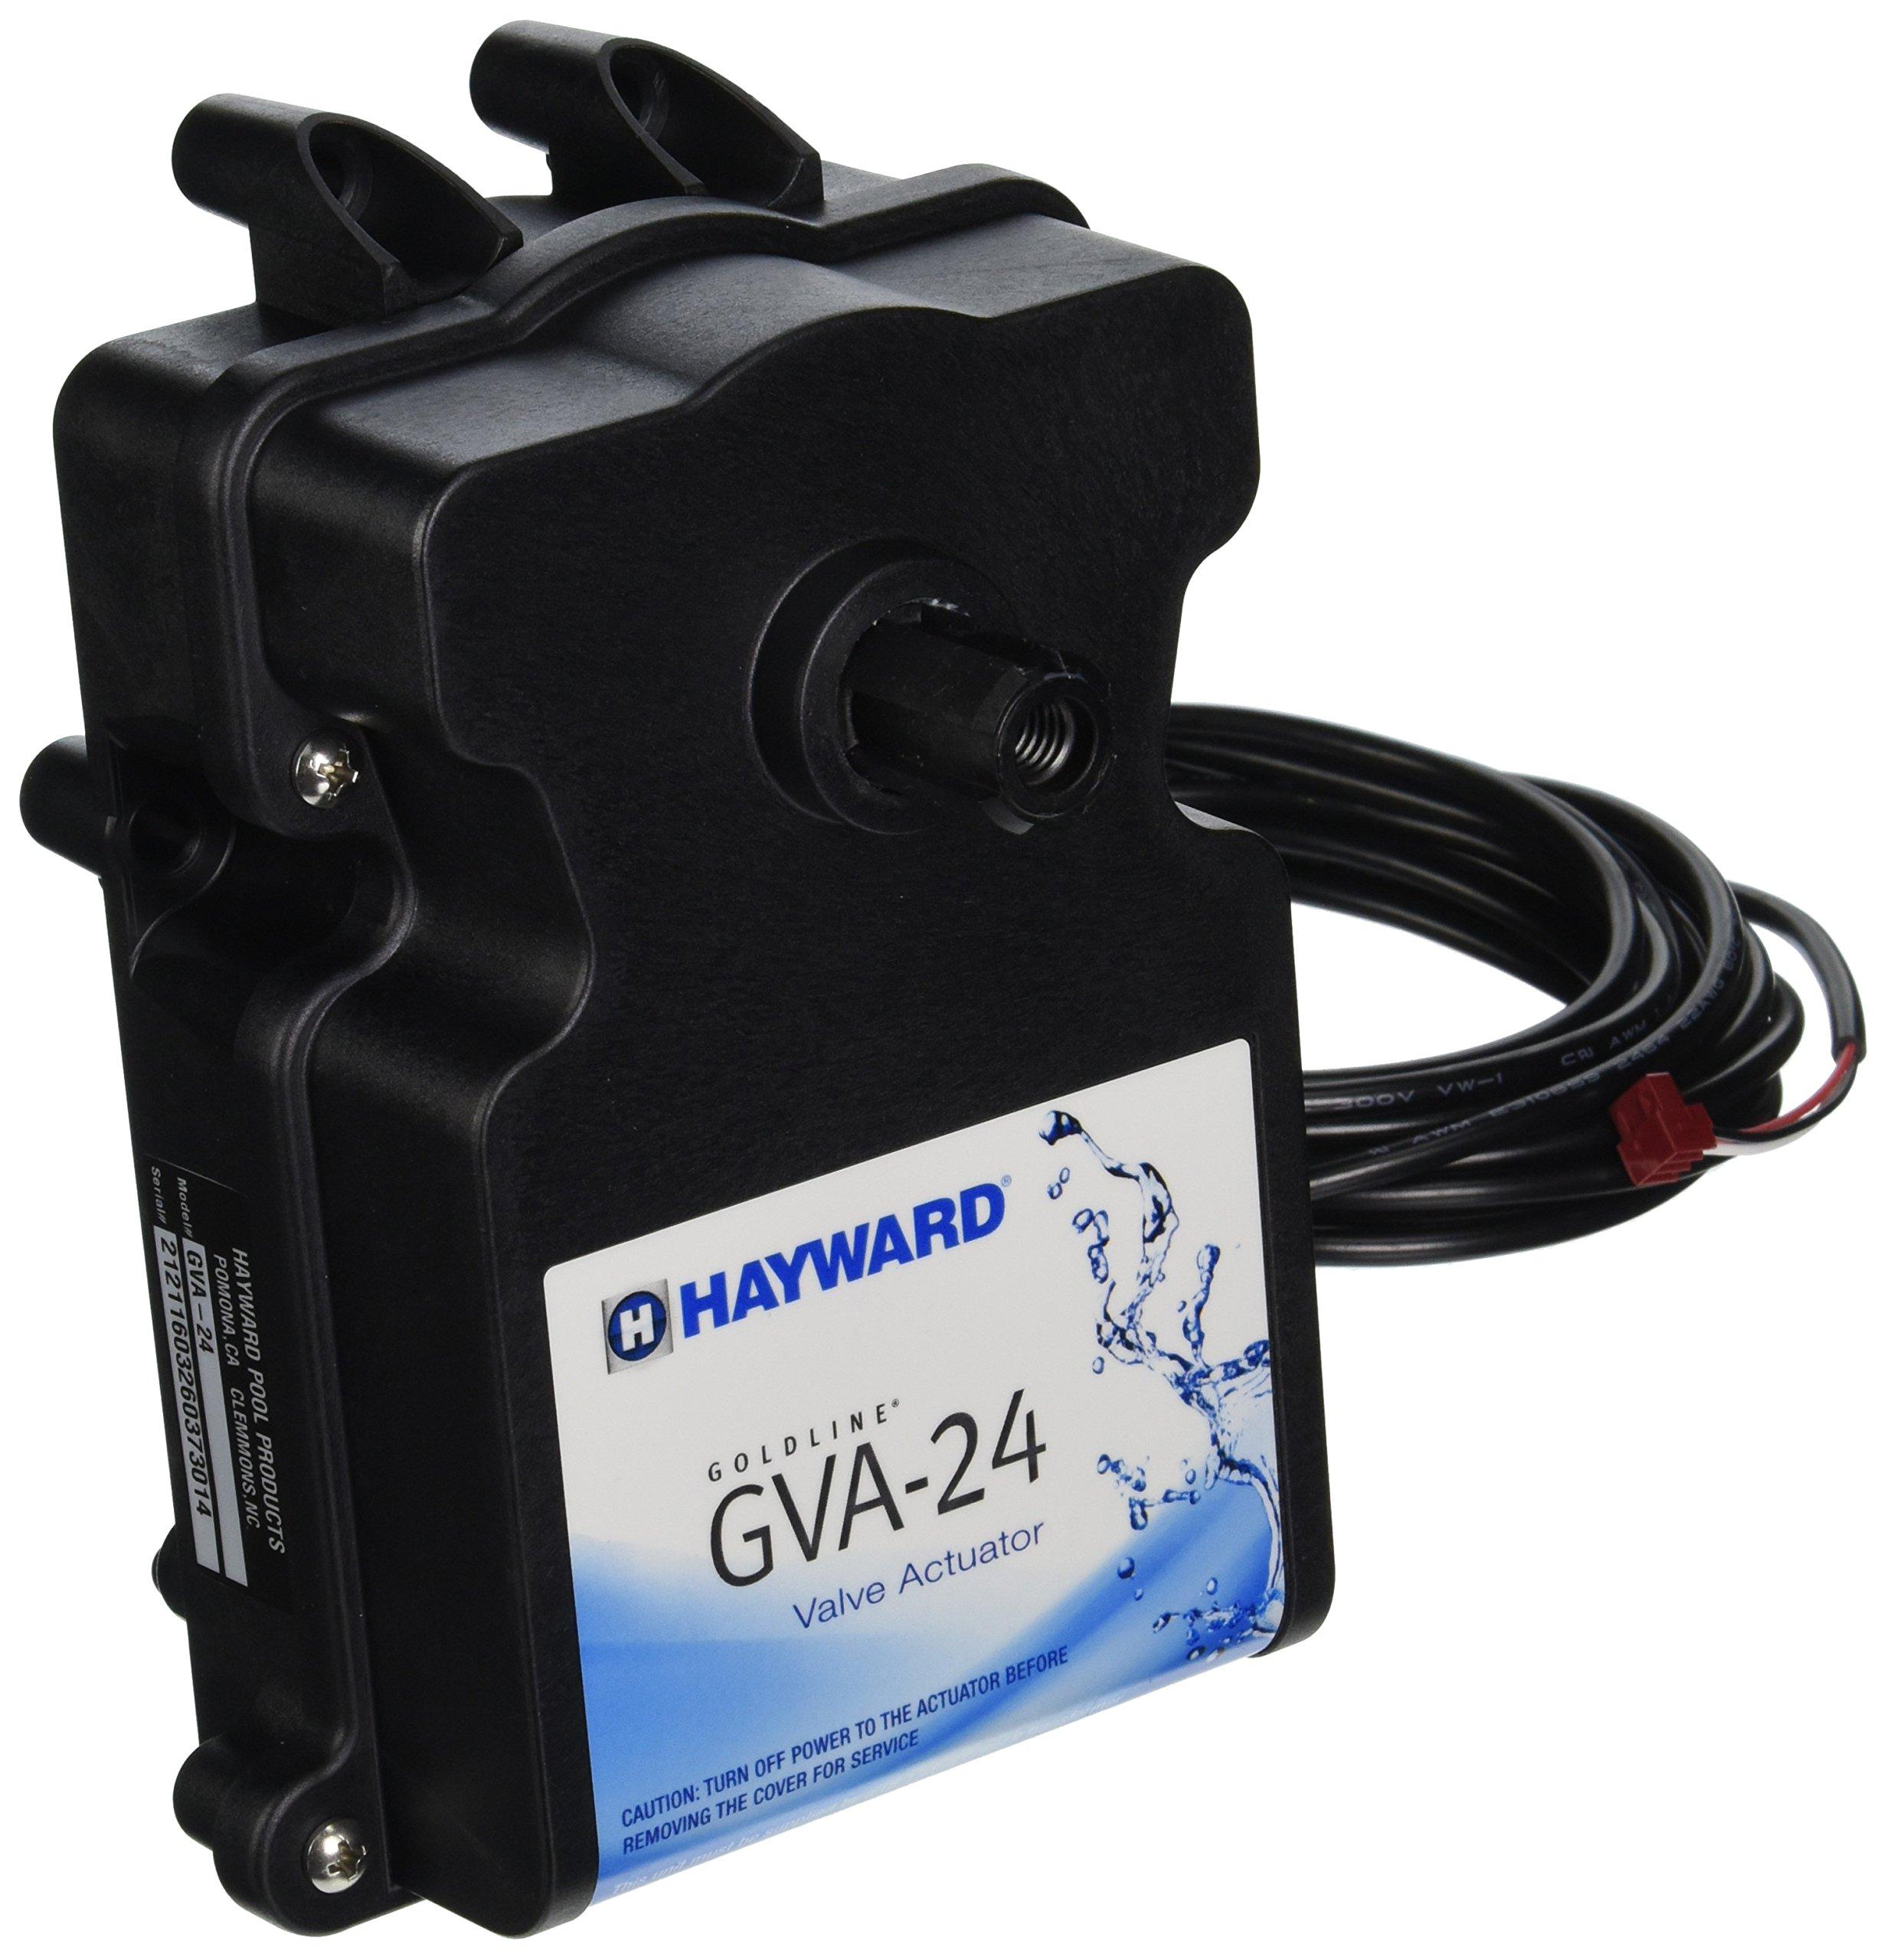 Hayward Gva 24 Valve Actuator Replacement Garden Outdoor In Floor Pool Cleaning Diagram Including Printed Circuit Board